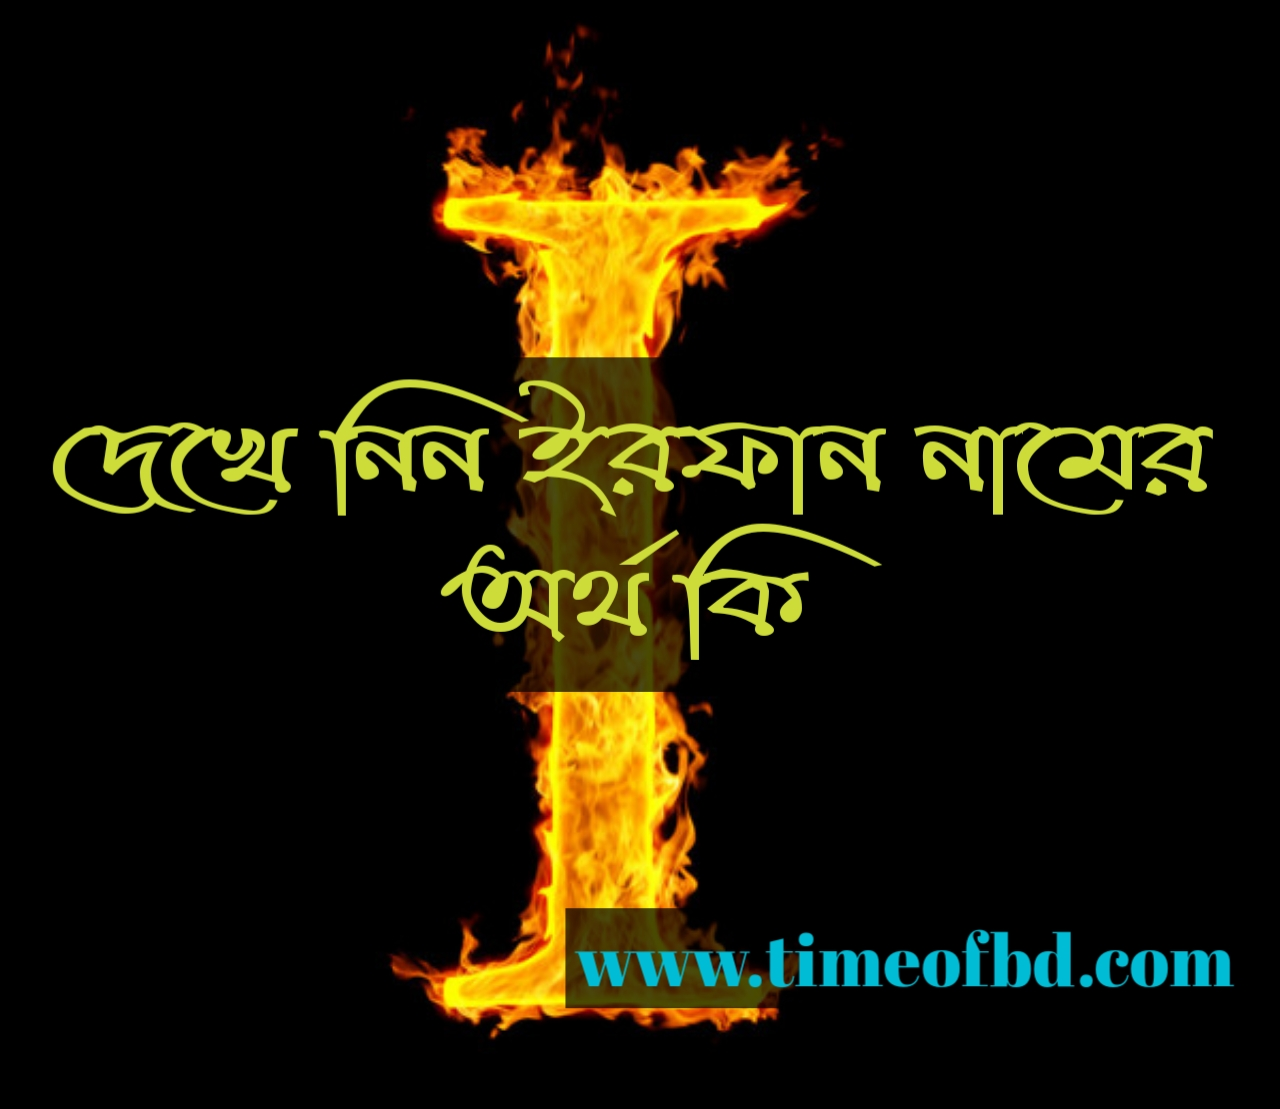 Irfan name meaning in Bengali, ইরফান নামের অর্থ কি, ইরফান নামের বাংলা অর্থ কি, ইরফান নামের ইসলামিক অর্থ কি,